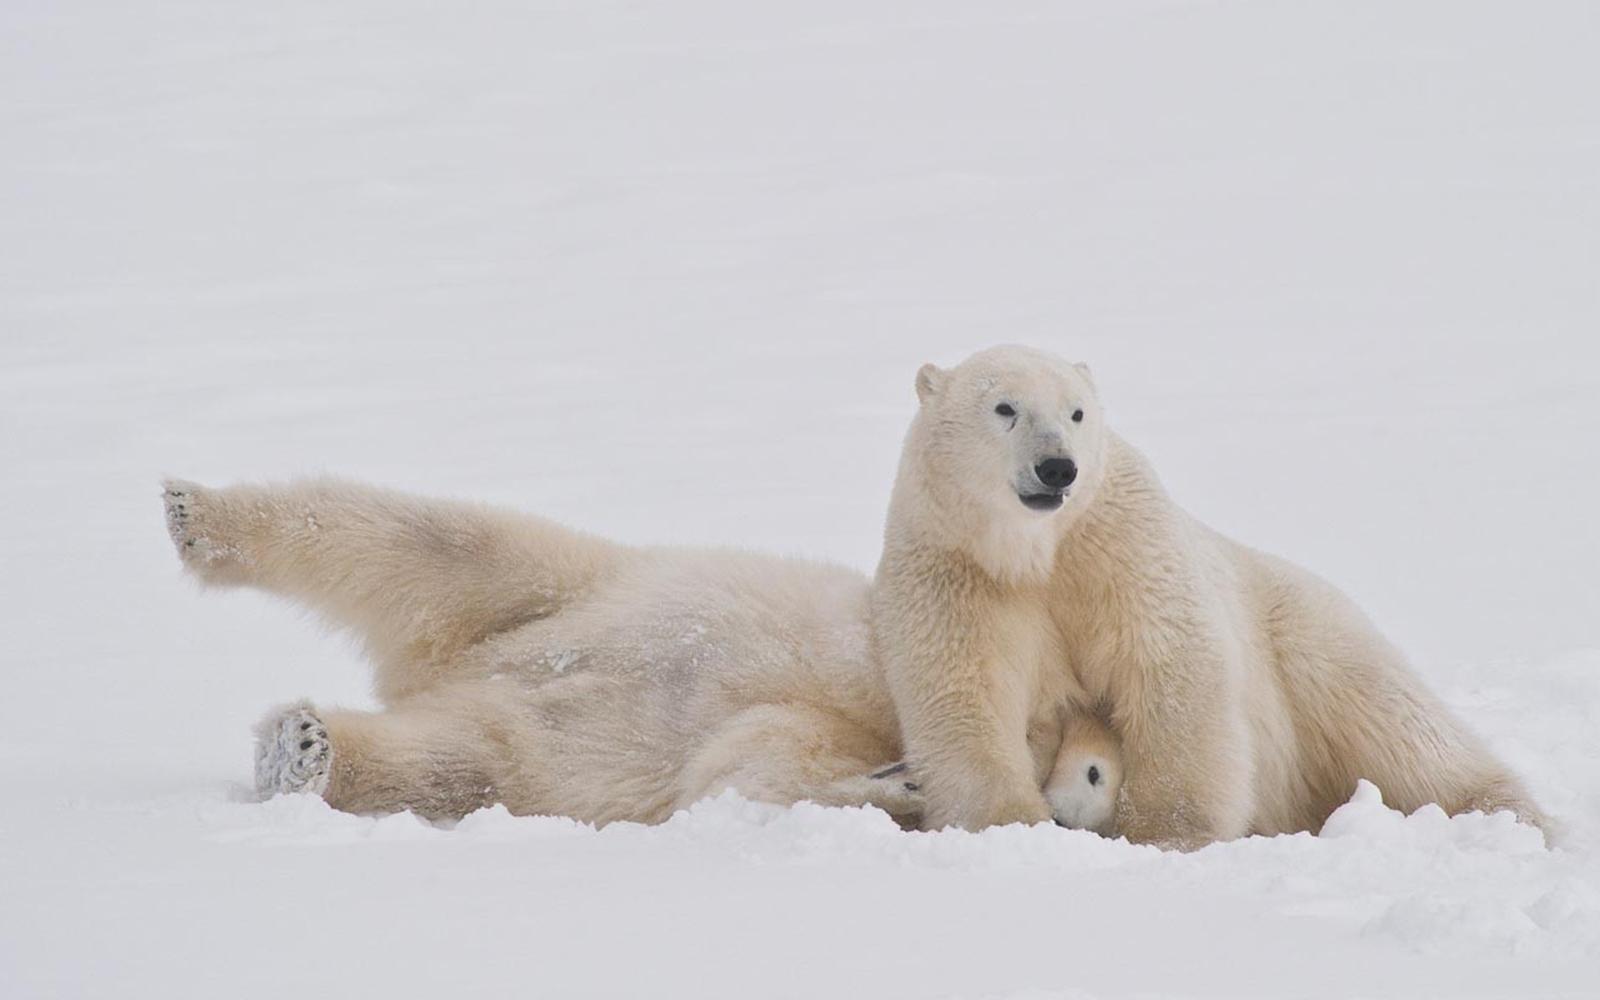 Eisbärenbeobachtung im Herbst